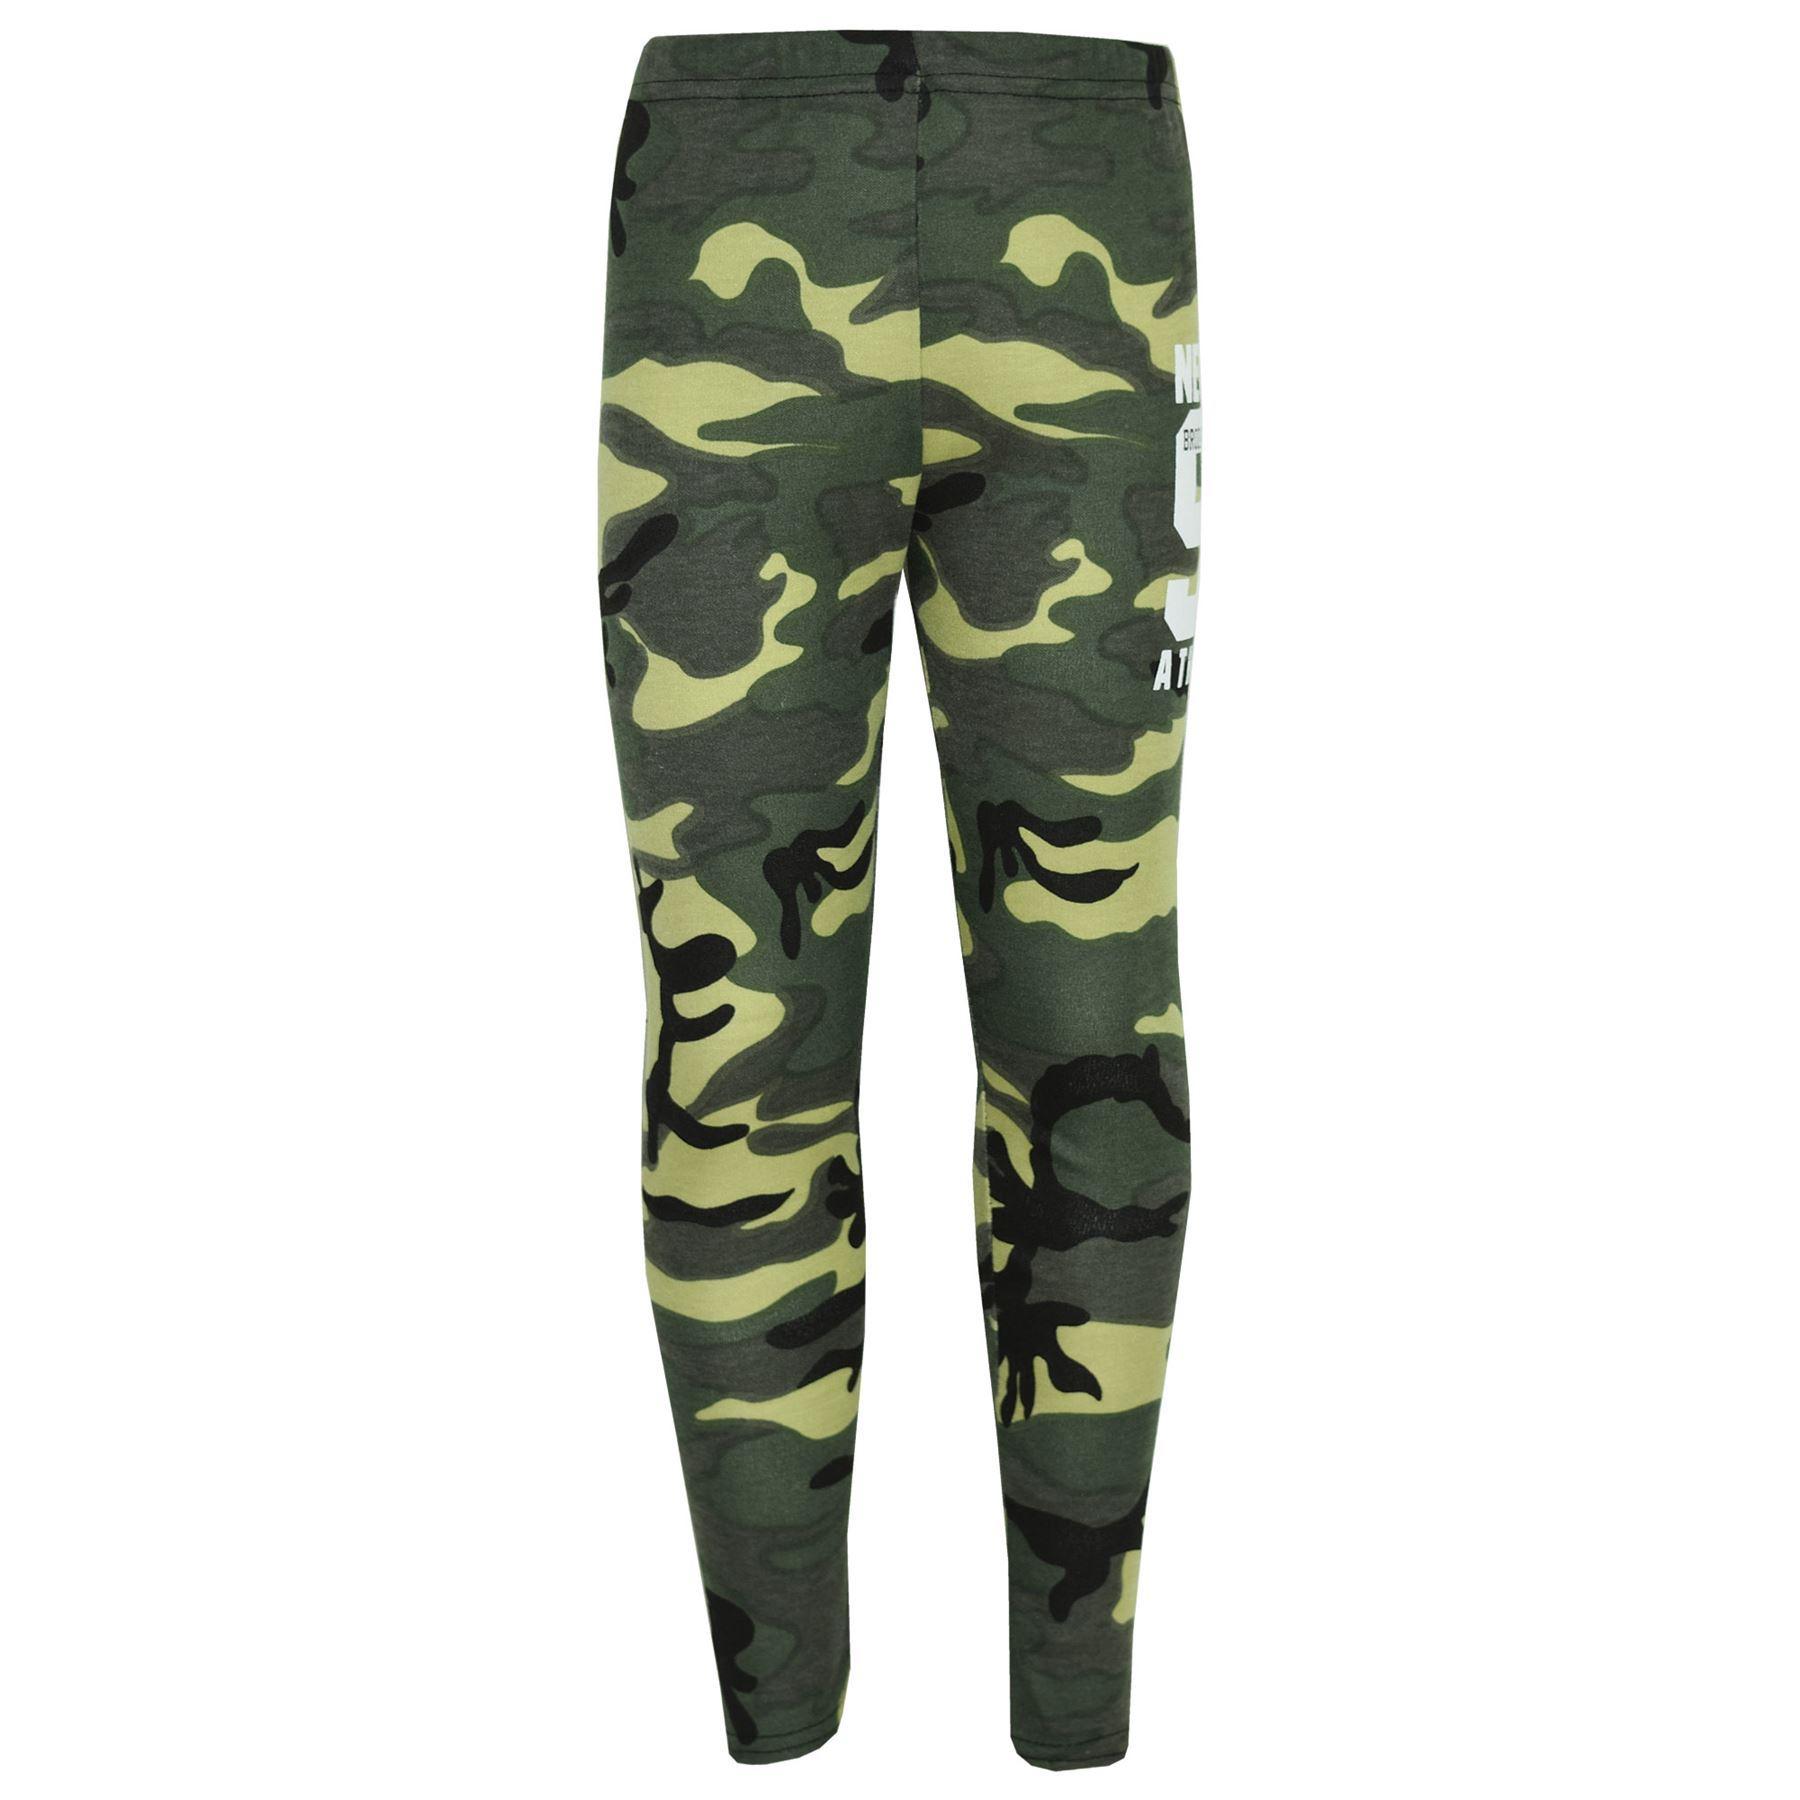 Girls-NEW-YORK-BROOKLYN-98-ATHLECTIC-Camouflage-Print-Top-amp-Legging-Set-7-13-Yr thumbnail 24